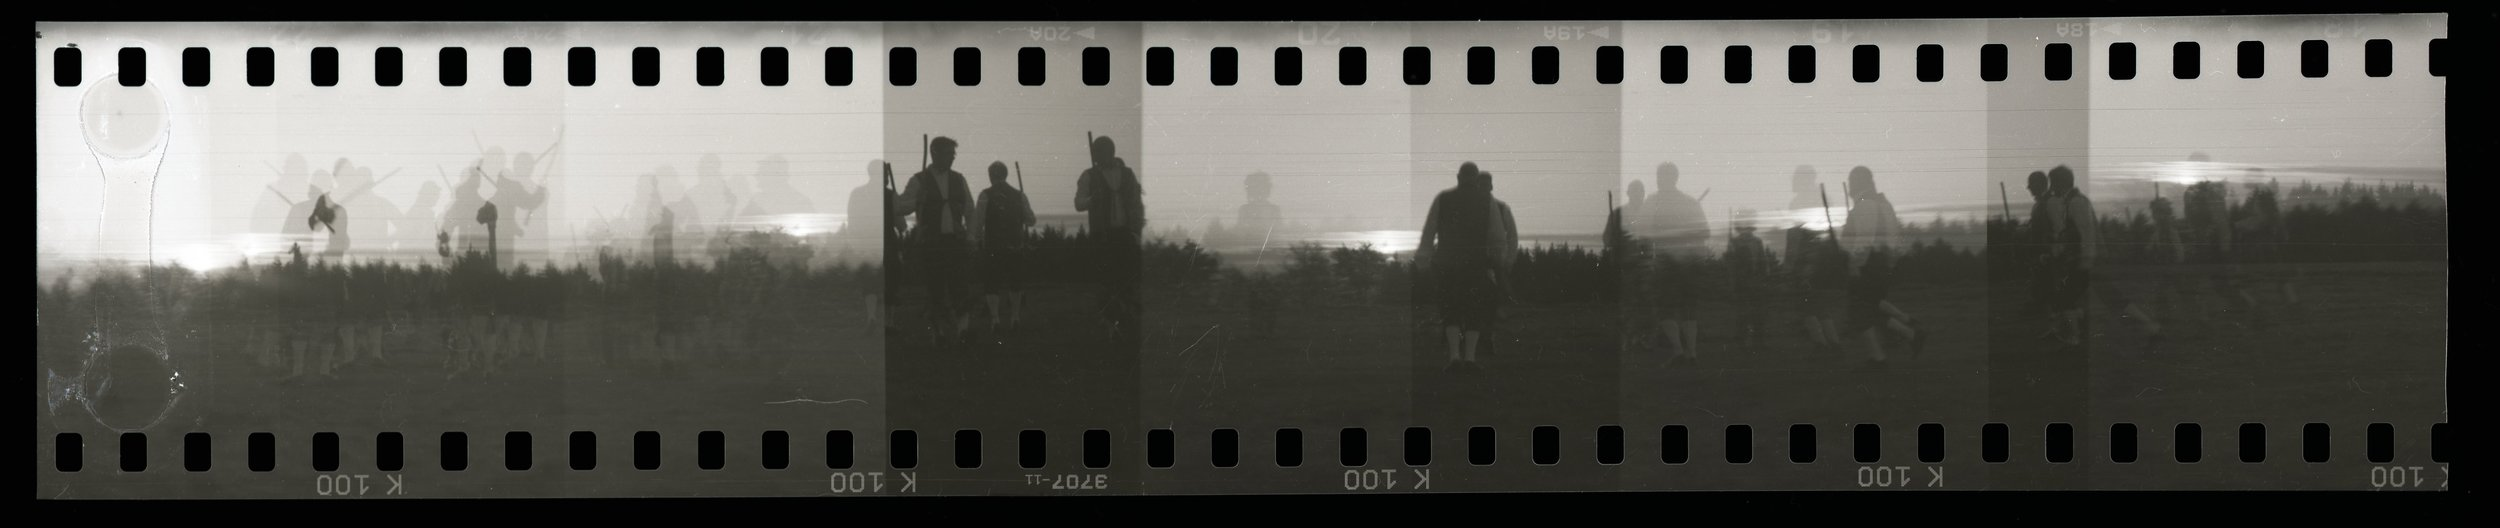 experimental photography.jpg